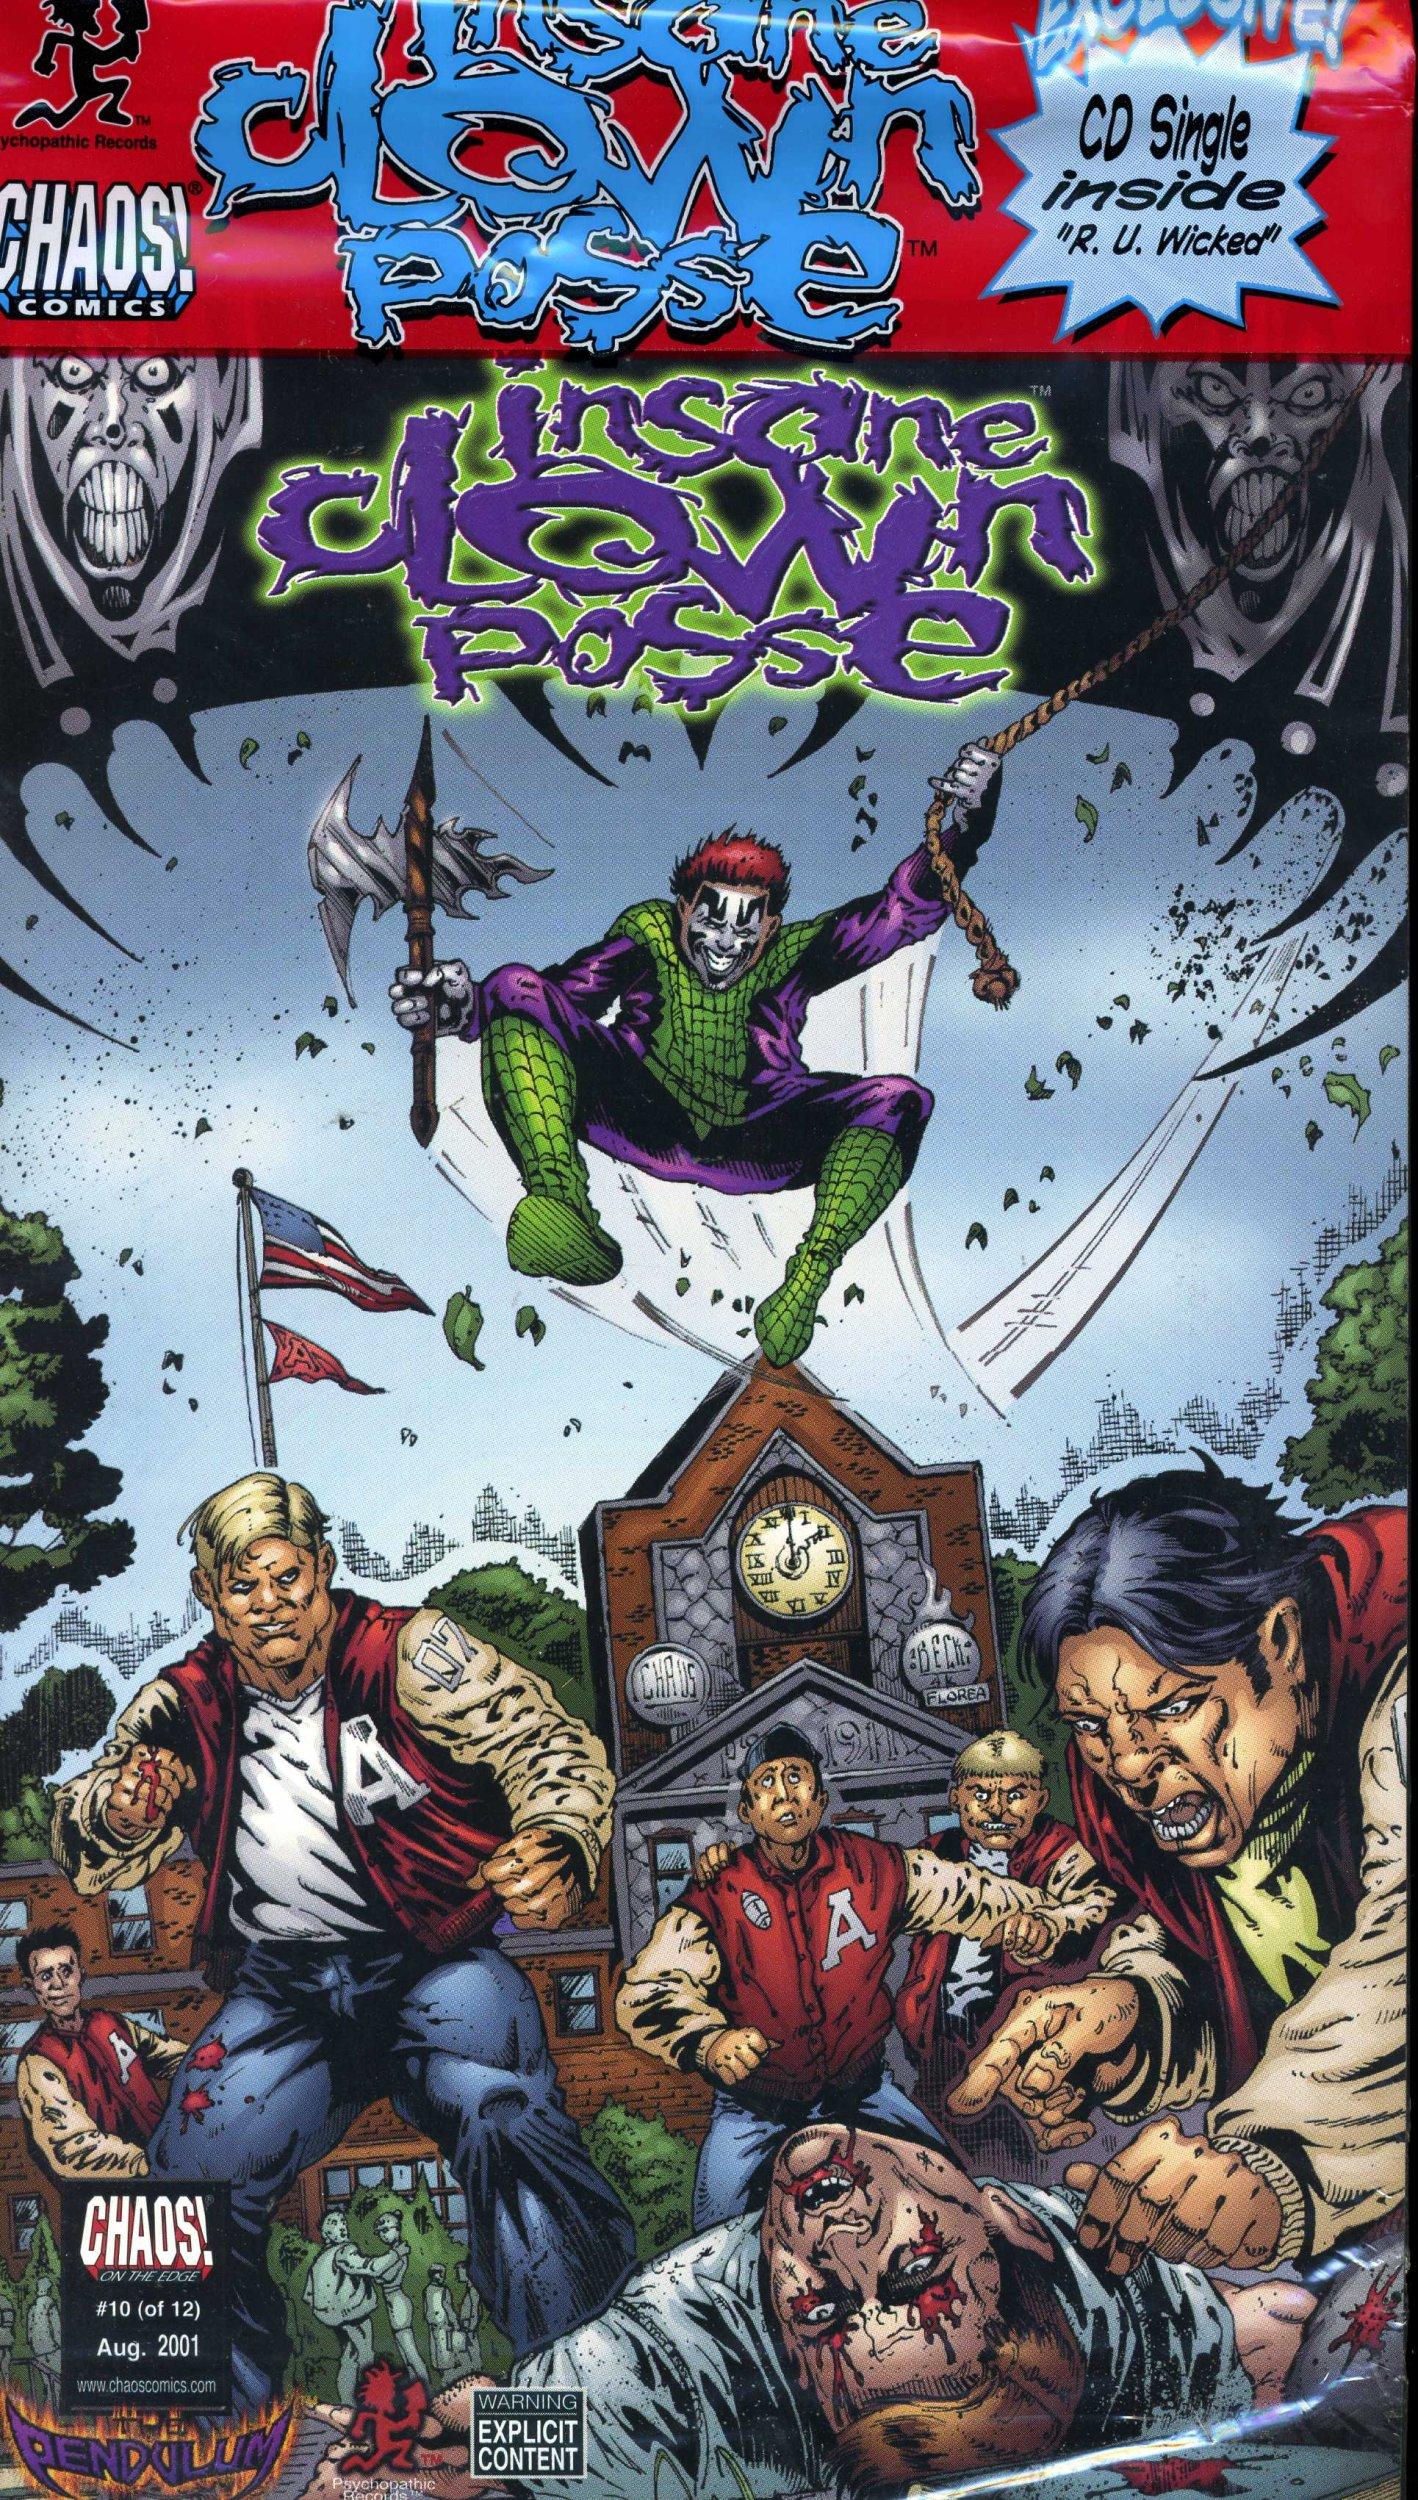 insane clown posse the pendulum 10 comic cd new icp jesse mccann